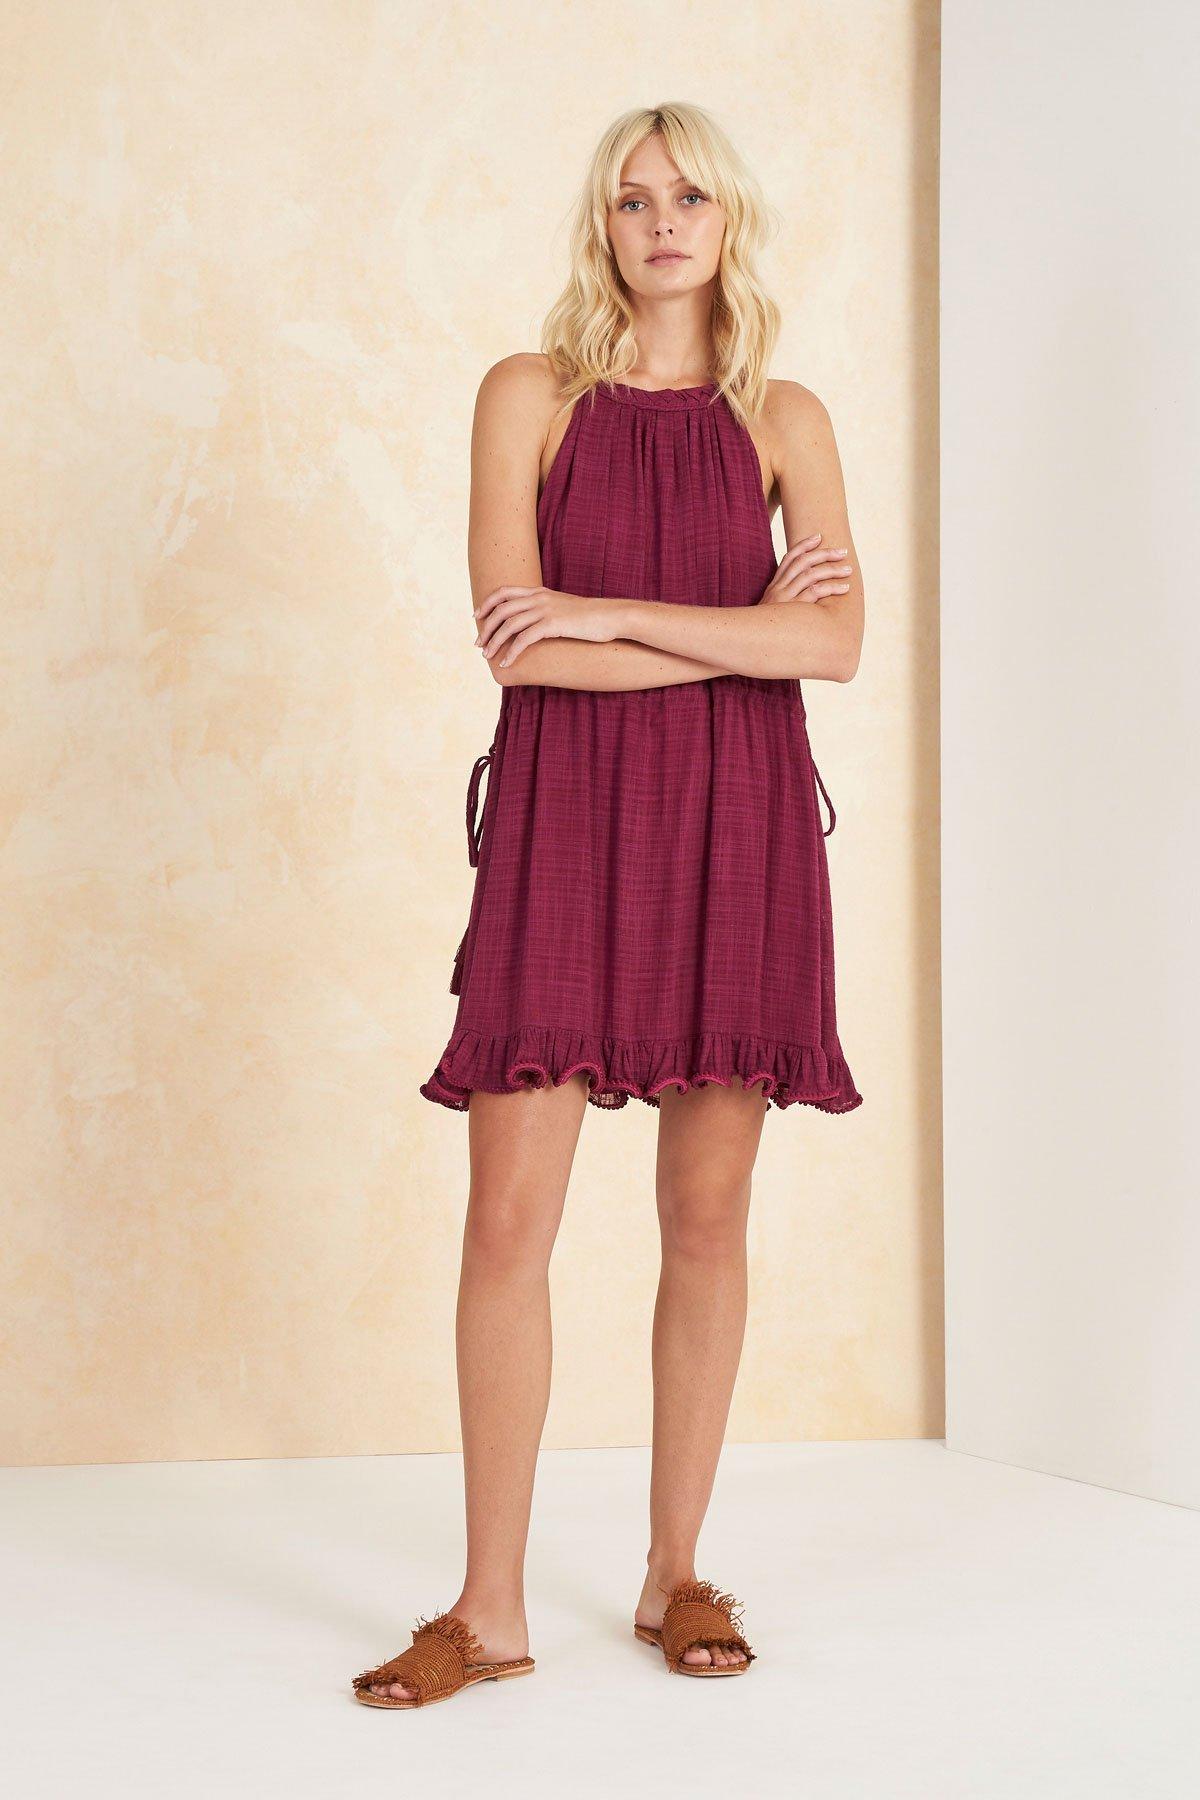 Image of Paradalis Mini Dress - Magenta